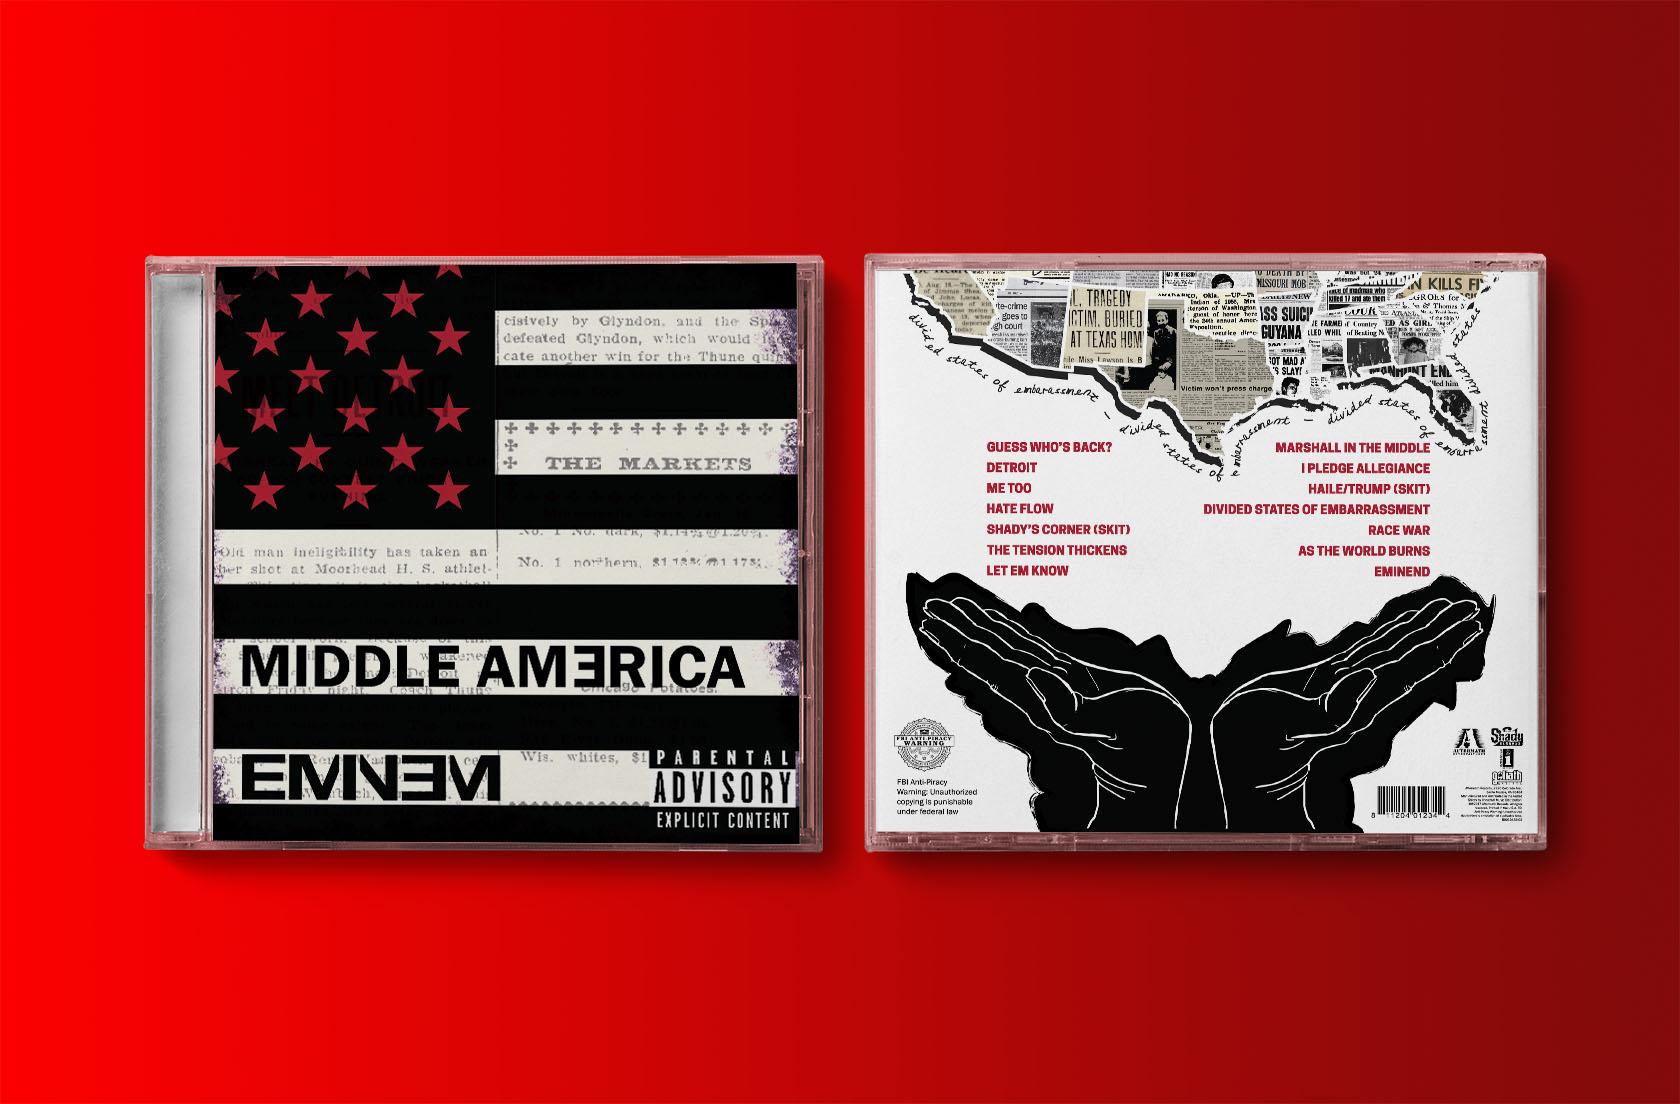 Eminem Album.jpg